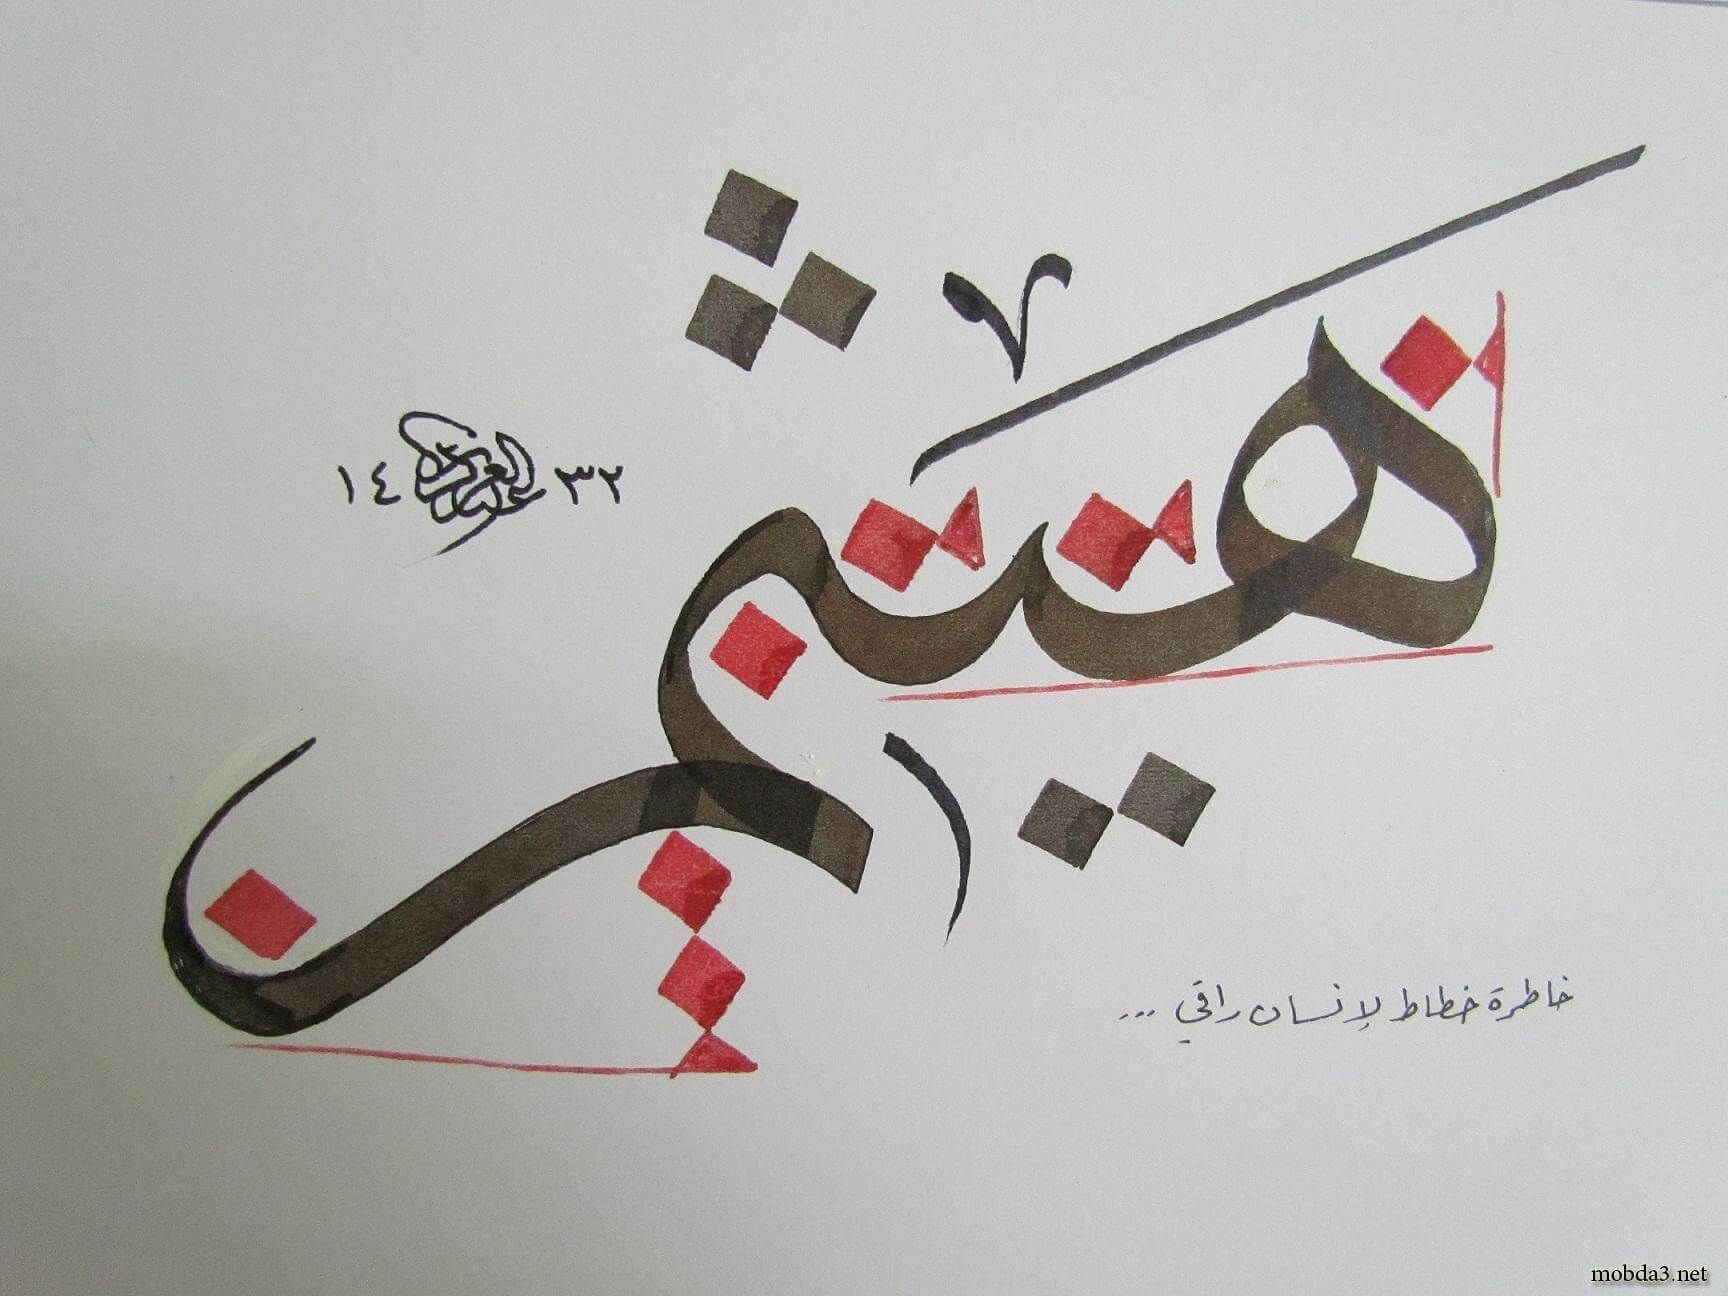 معنى اسم هيثم Haitham Arabic Calligraphy Art Calligraphy